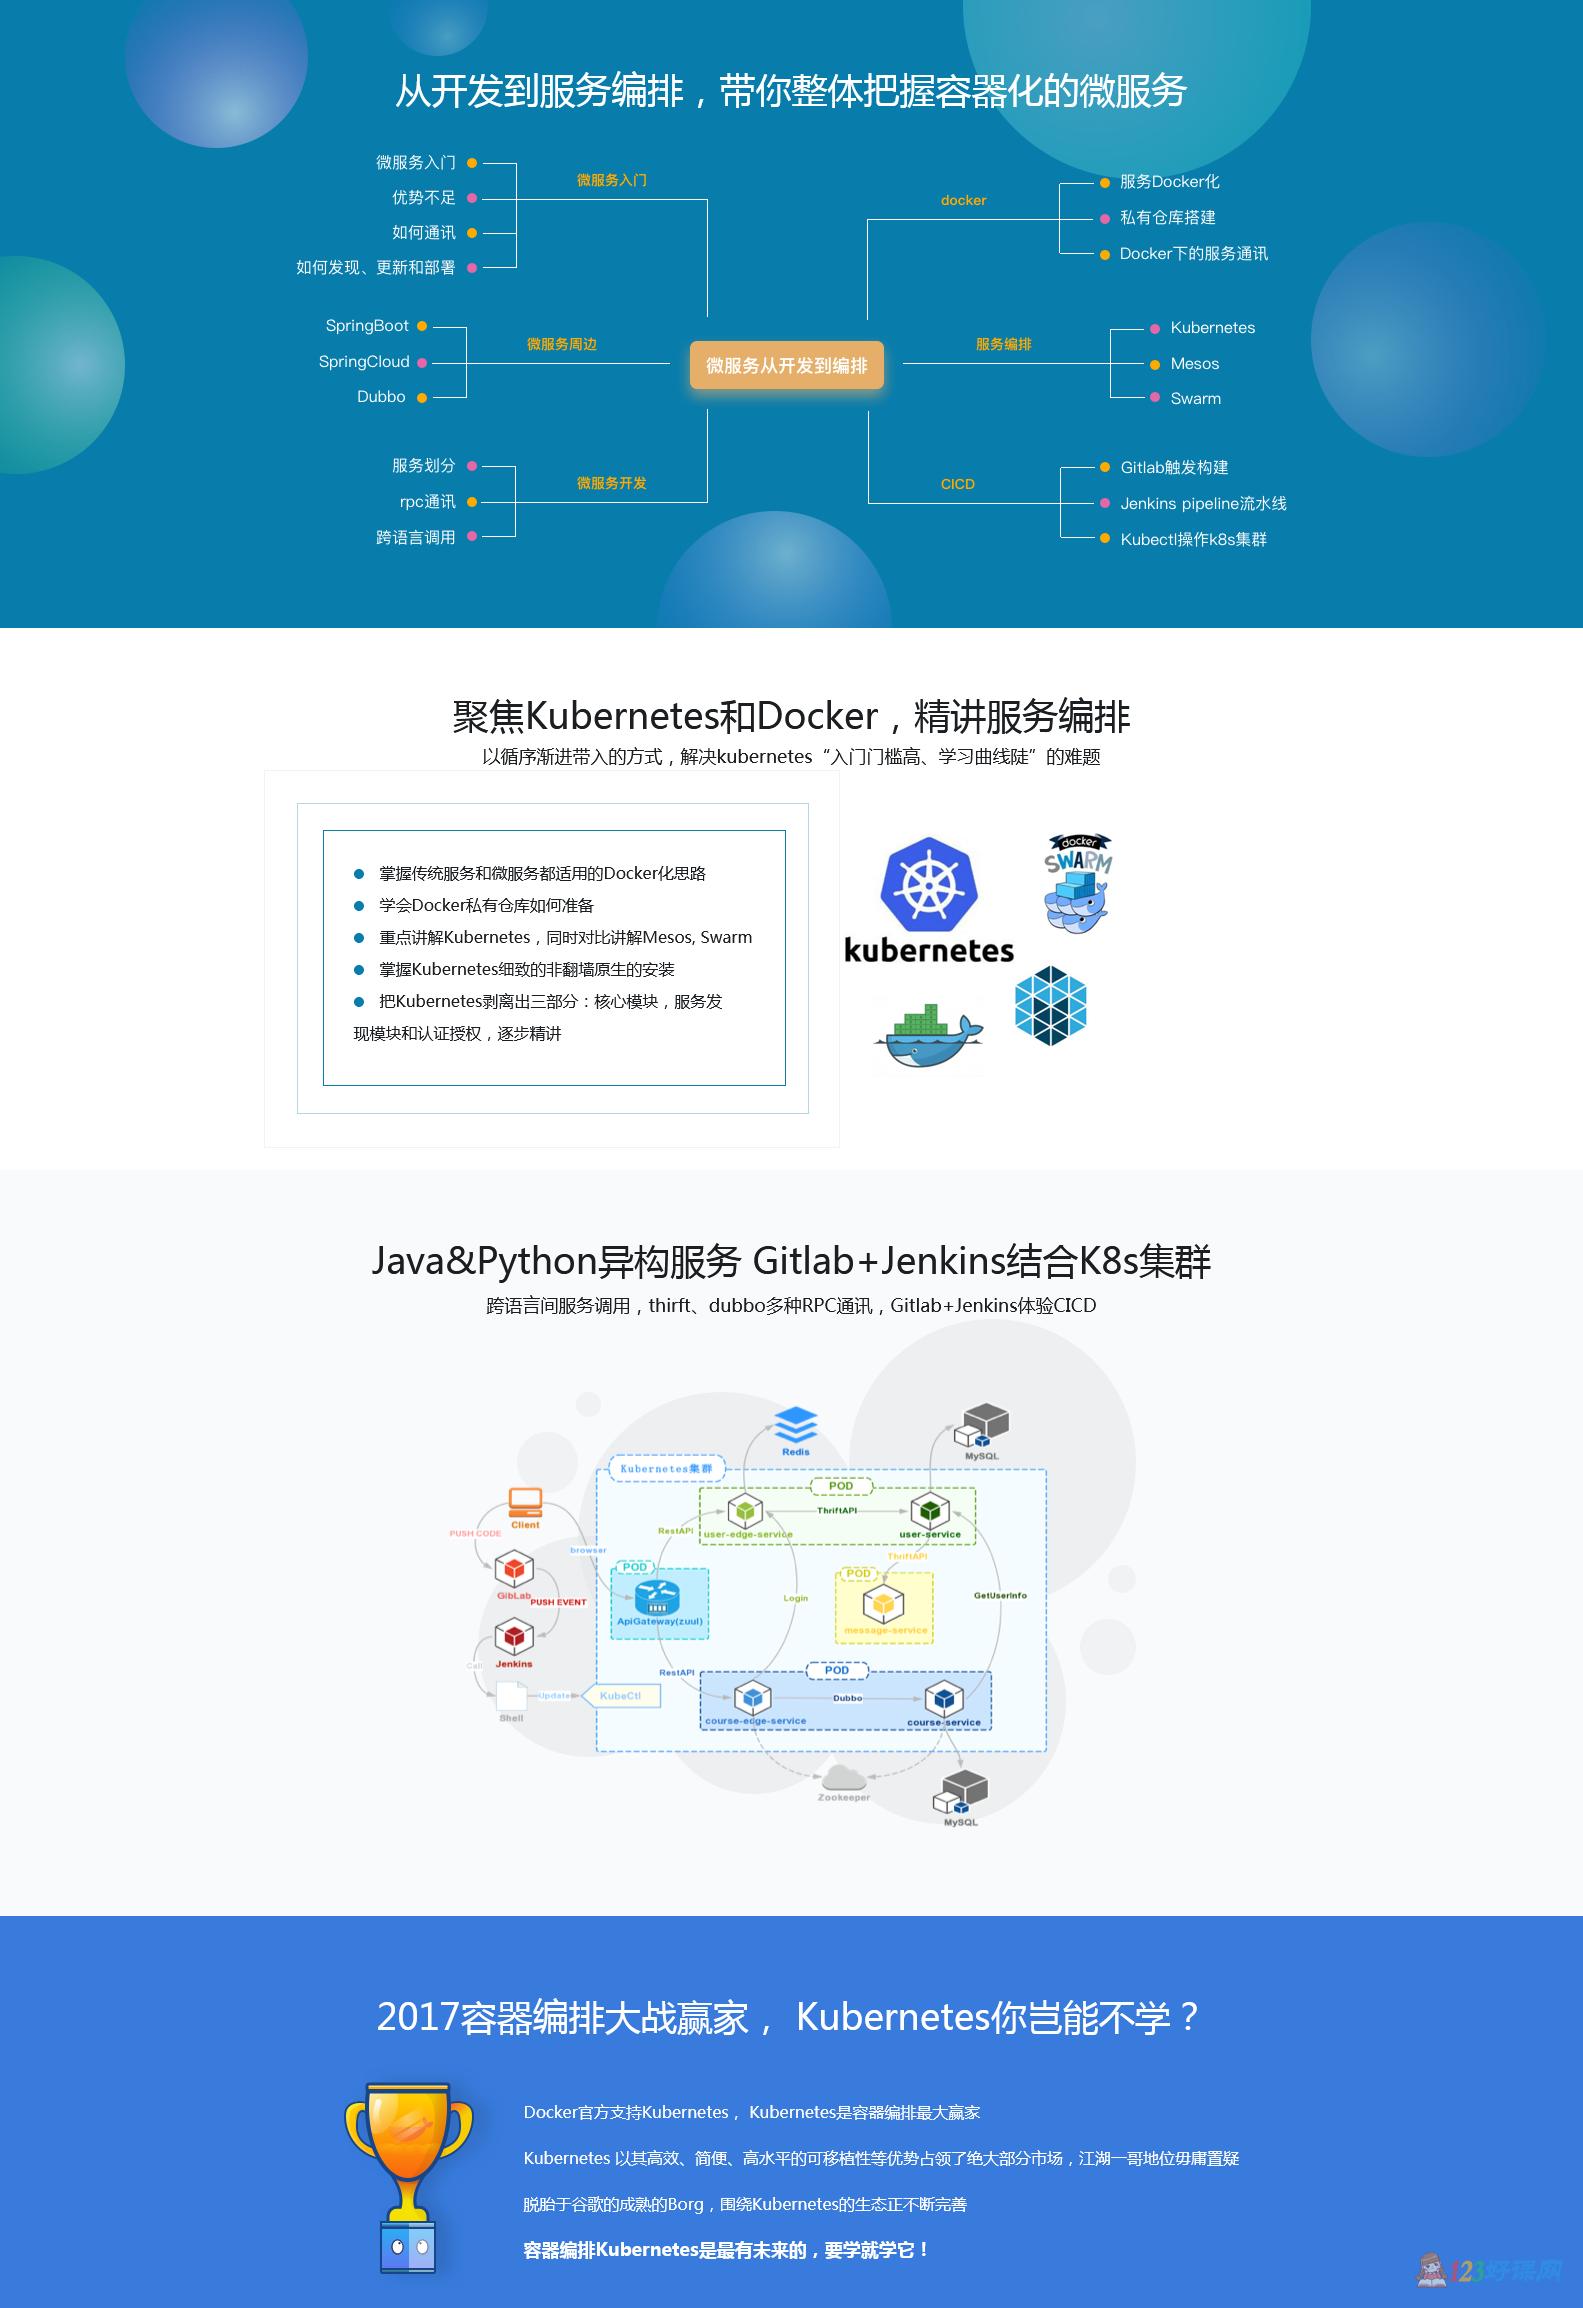 刘果国Docker+Kubernetes(k8s)微服务容器化实践